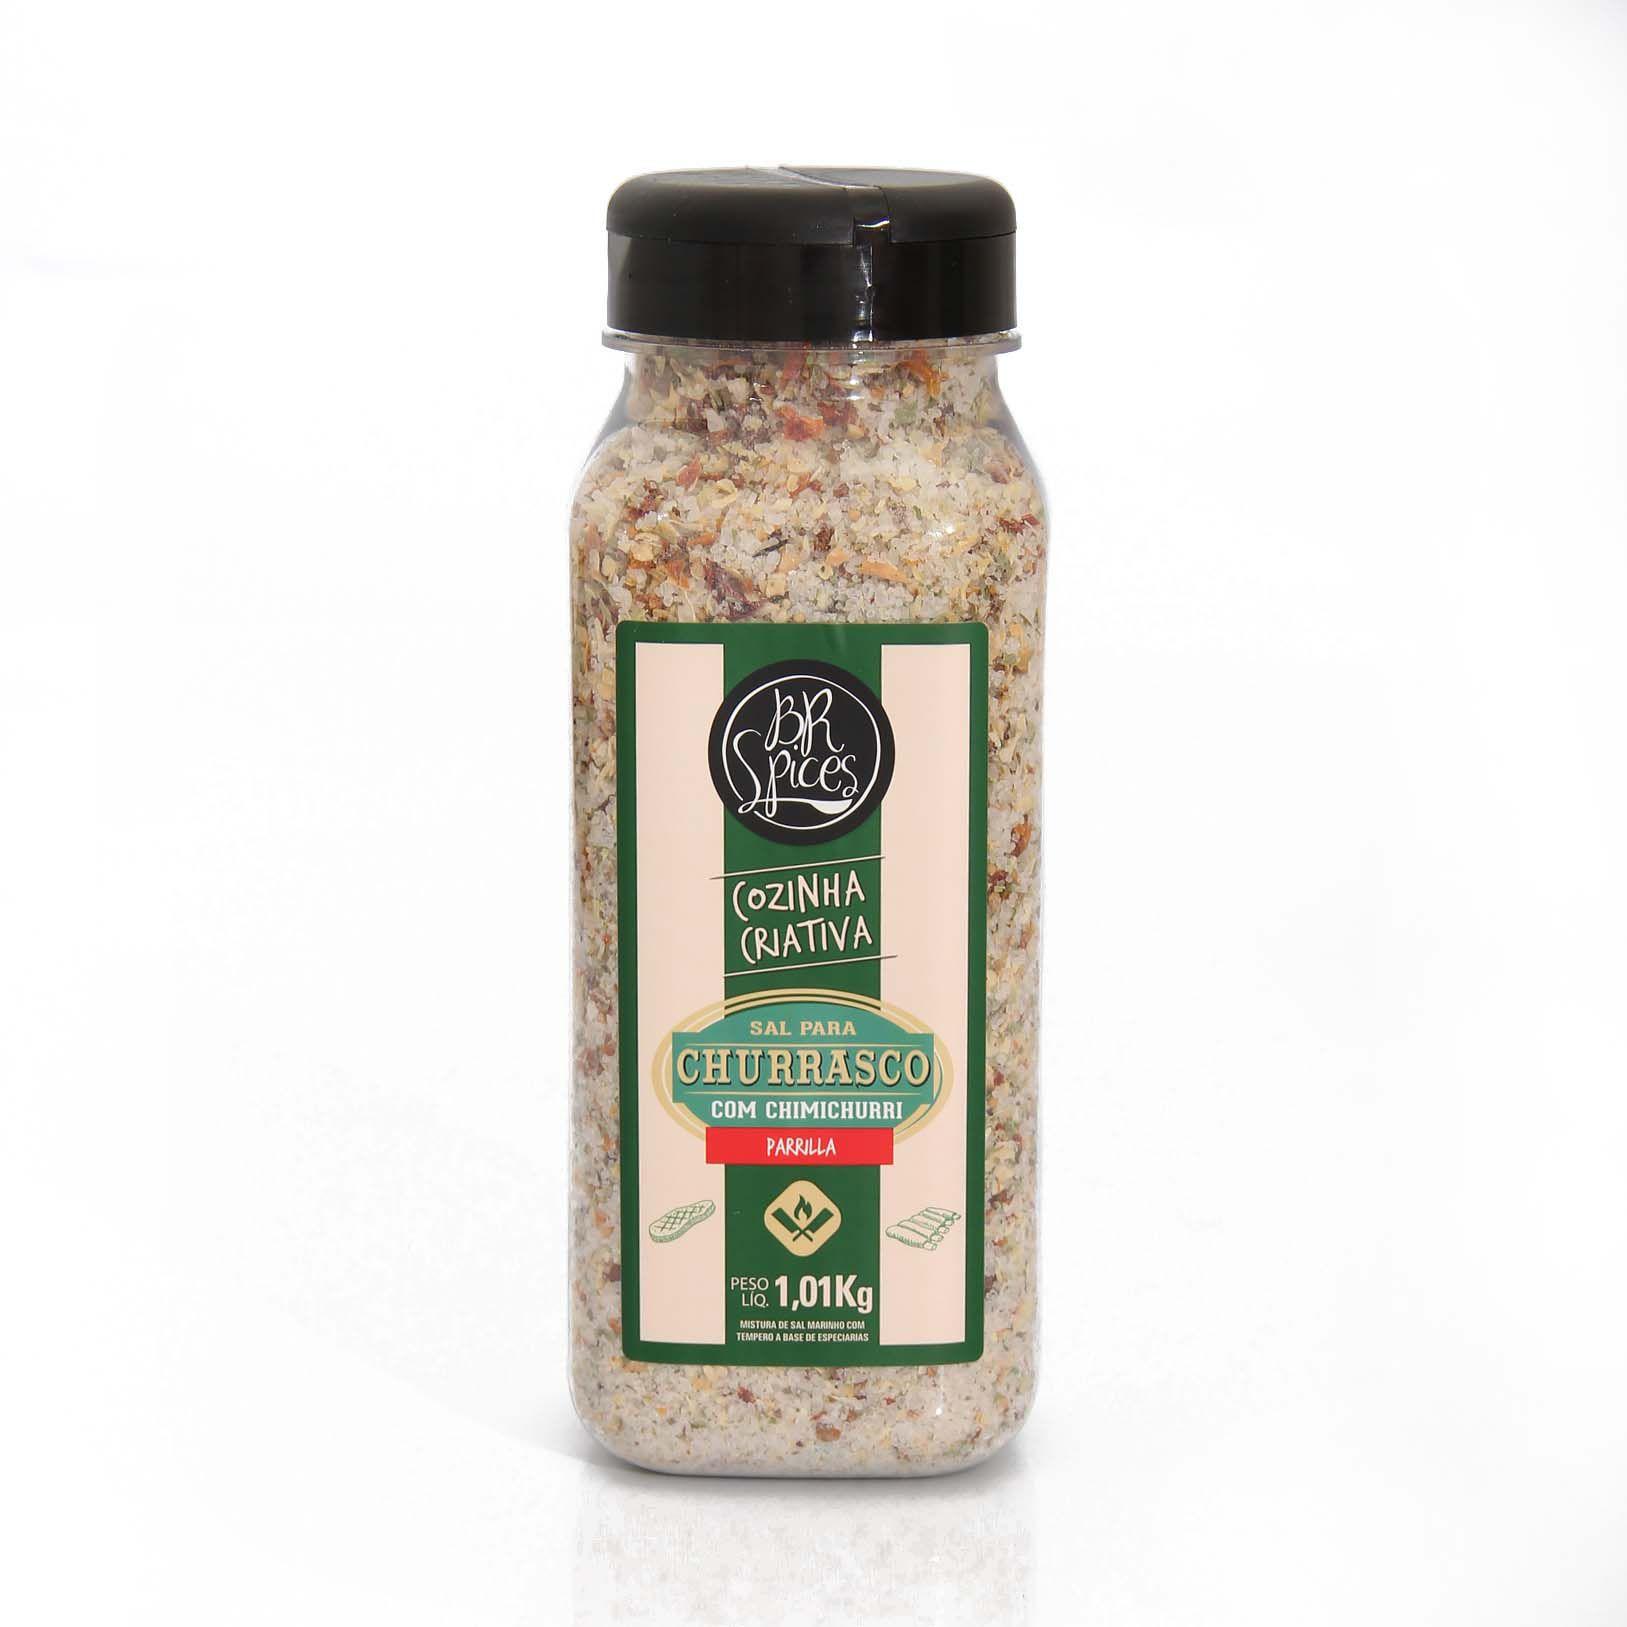 Tempero BR Spices - Sal Churrasco Chimichurri 1kg